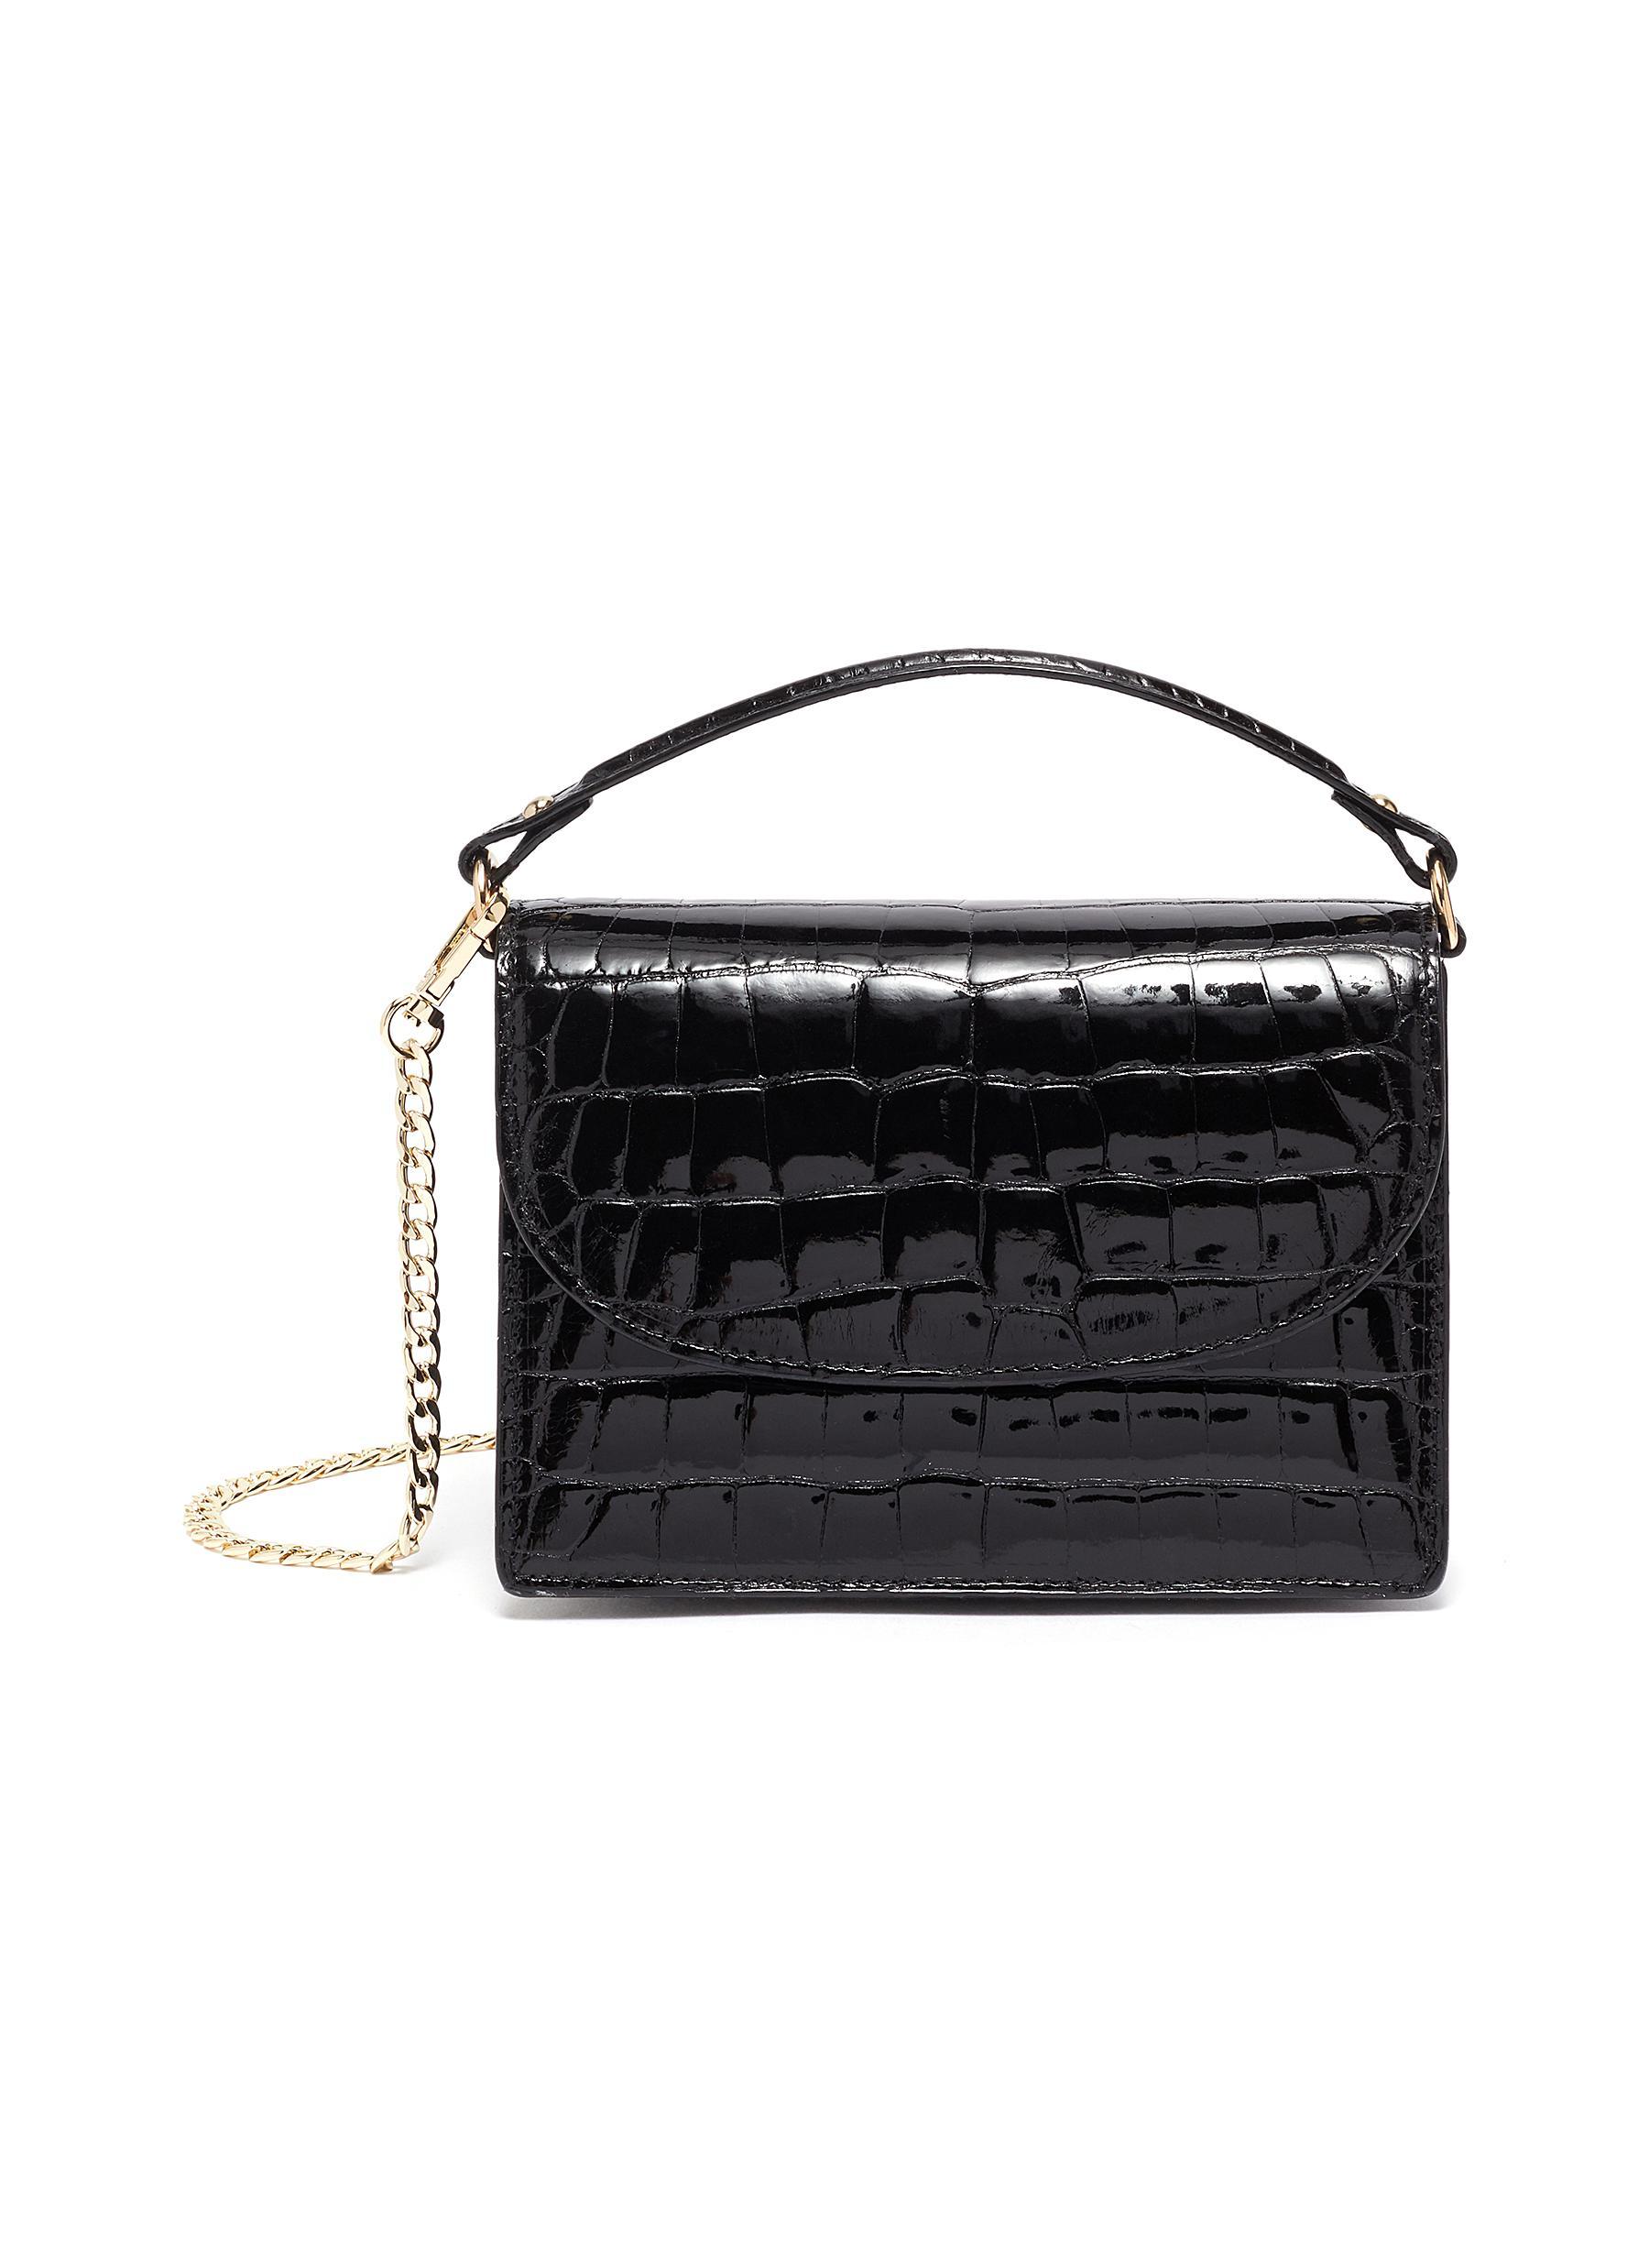 Valencia' Shiny Alligator Leather Crossbody Bag